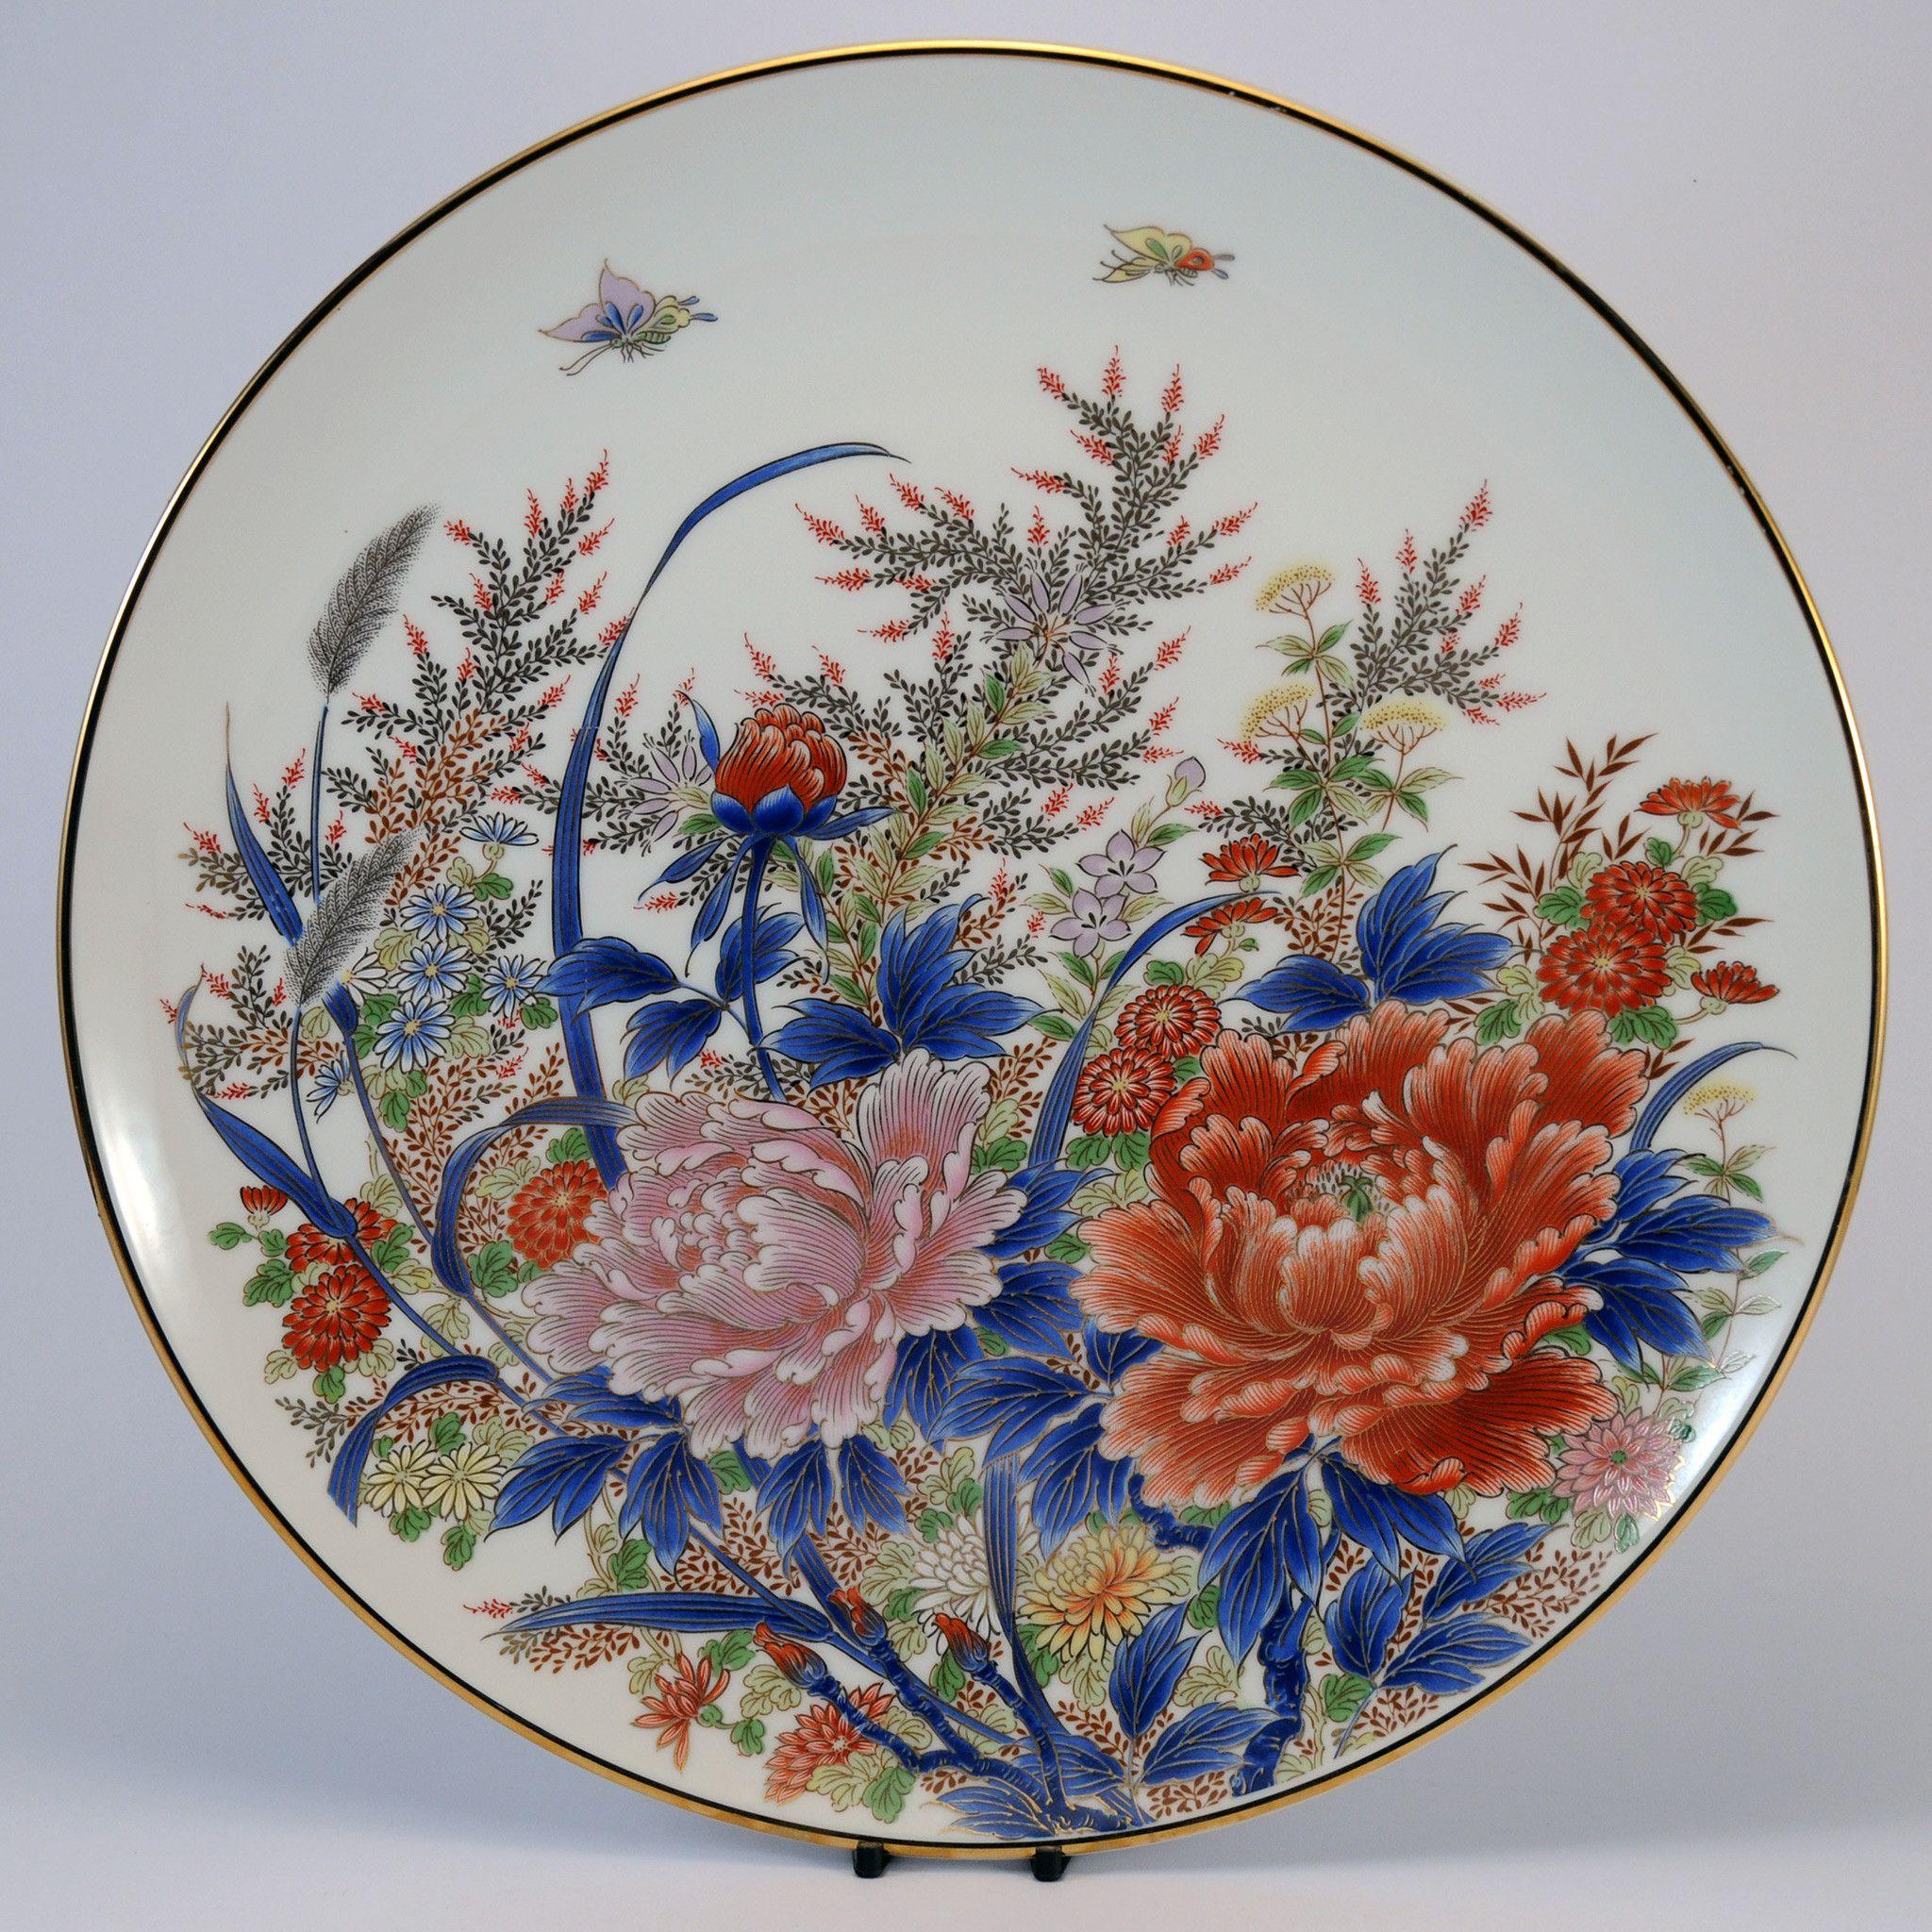 Decorative plates u2013 Katoomie .katoomie.com2048 × 2048Search by image Shibata Japanese decorative & Decorative plates u2013 Katoomie www.katoomie.com2048 × 2048Search by ...